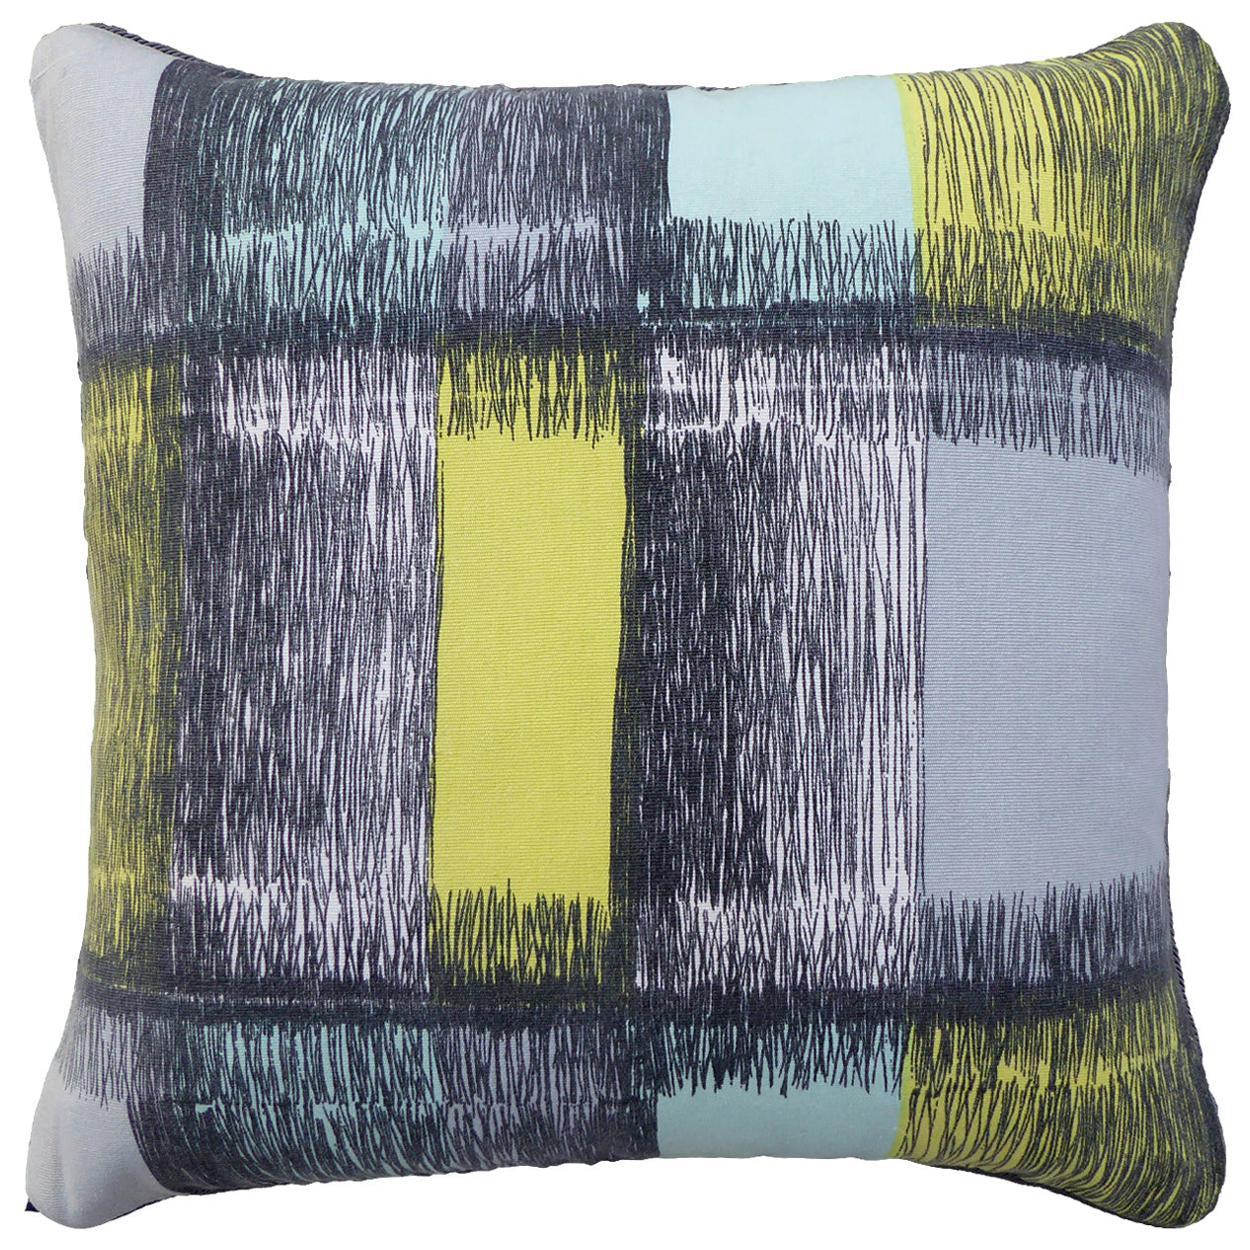 Vintage Cushions, Luxury Bespoke Made Pillow 'Aitken', Made in UK